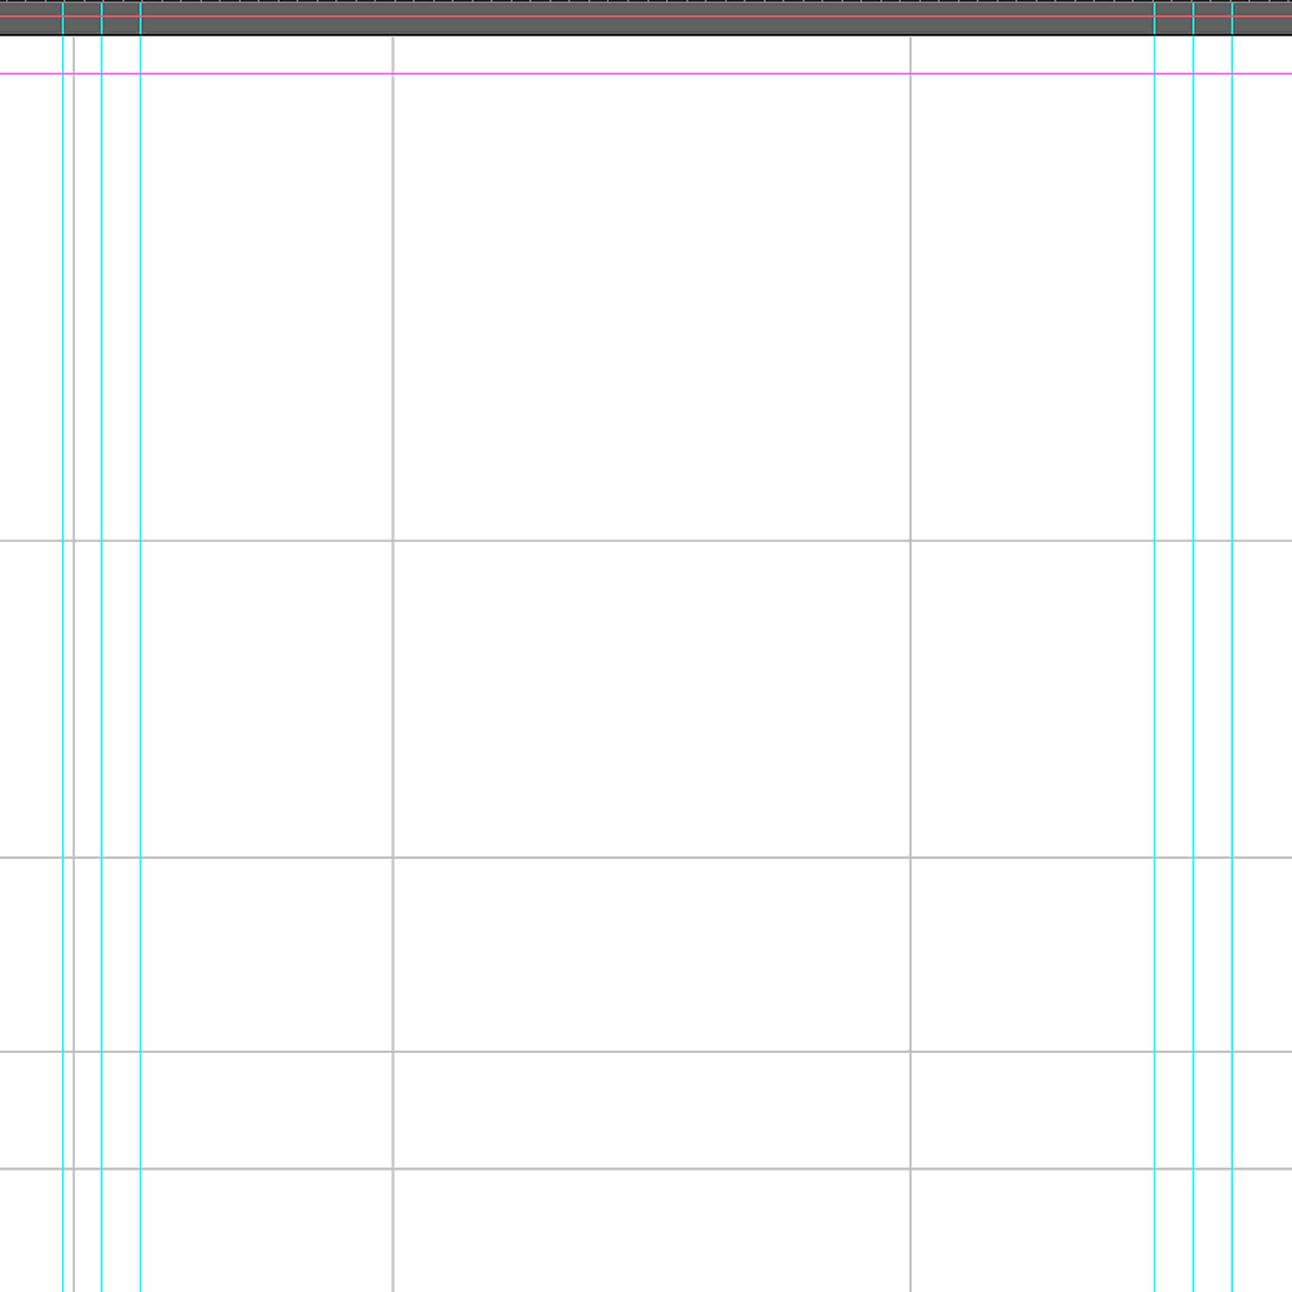 """ X "" Gatefold Brochure  Print Template Regarding Gate Fold Brochure Template Indesign"